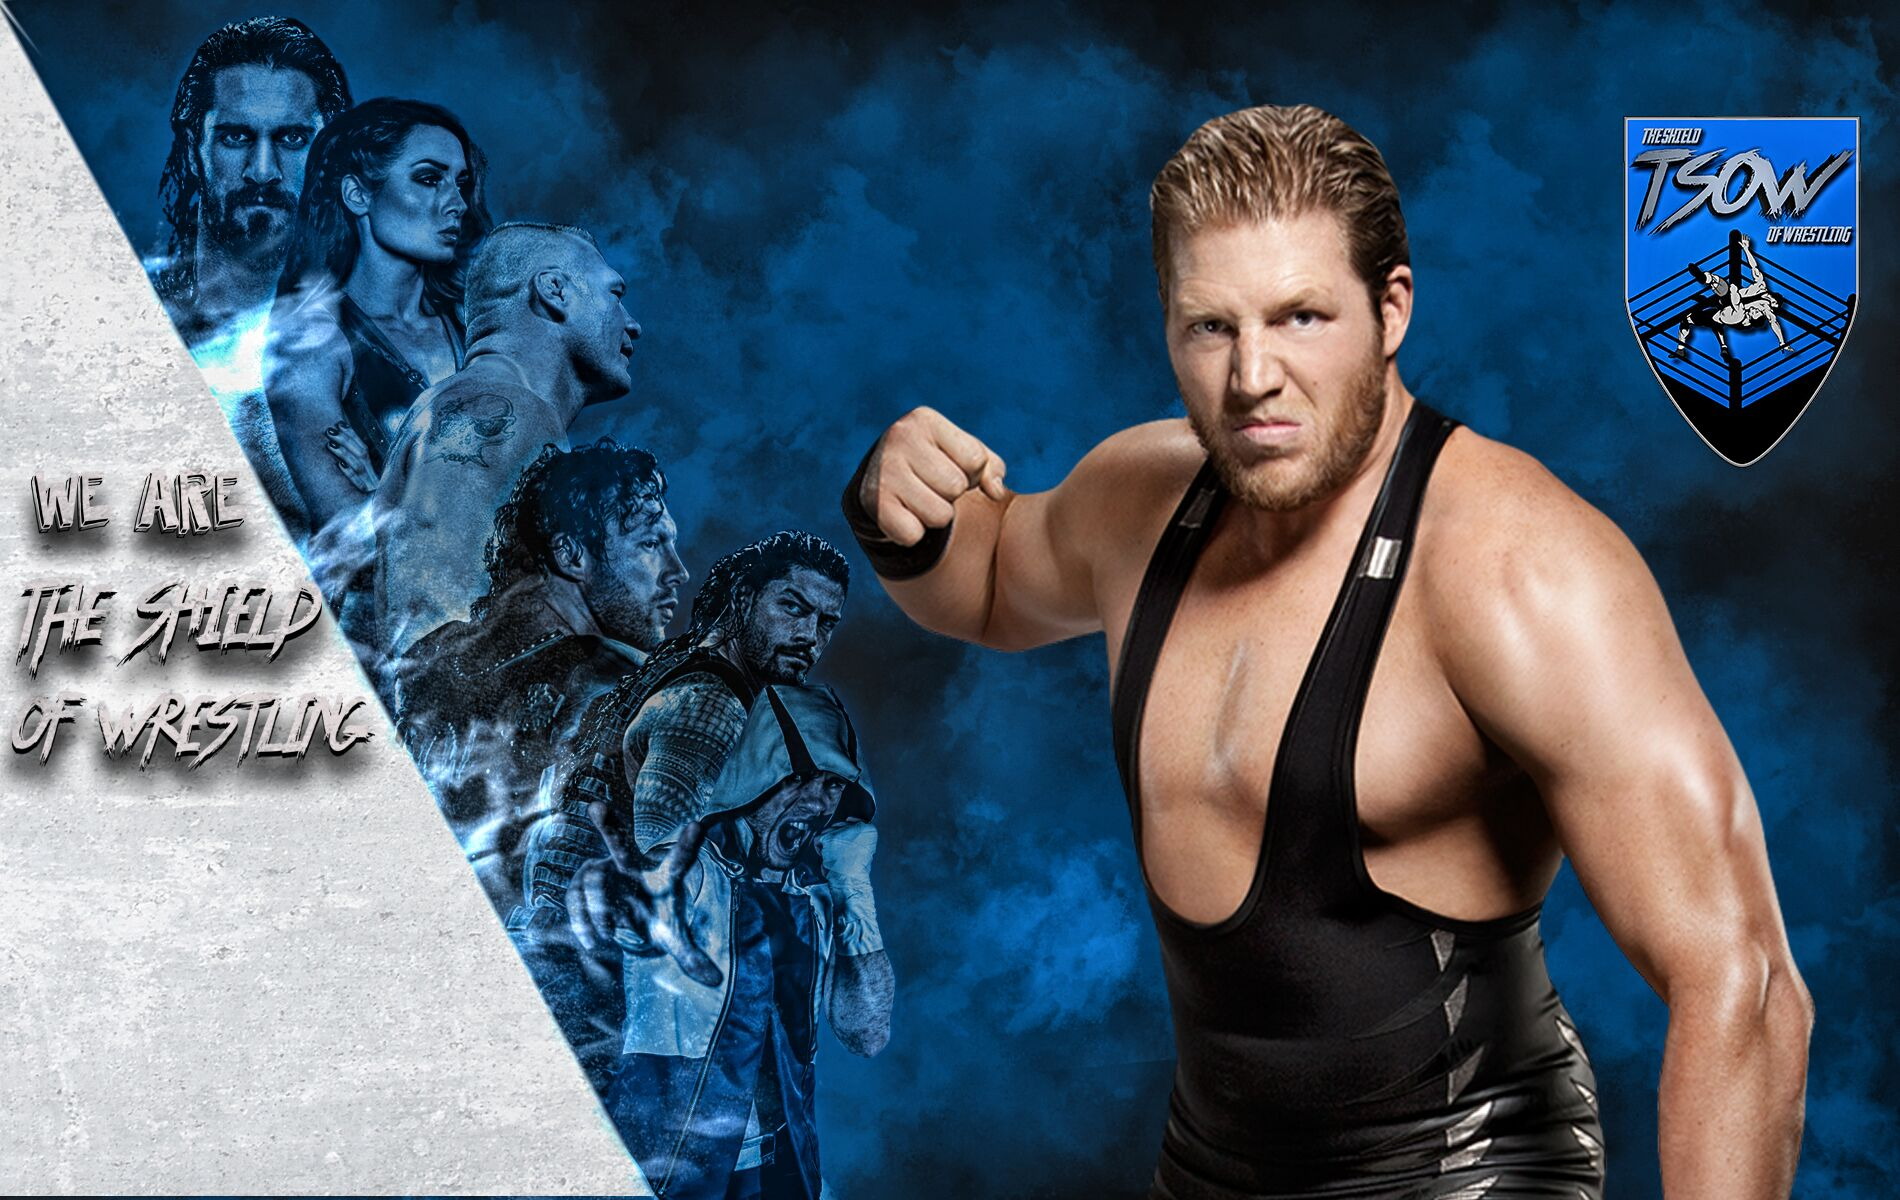 Jake Hager reagisce all'arrivo di Cain Velasquez in WWE - Jake Hager